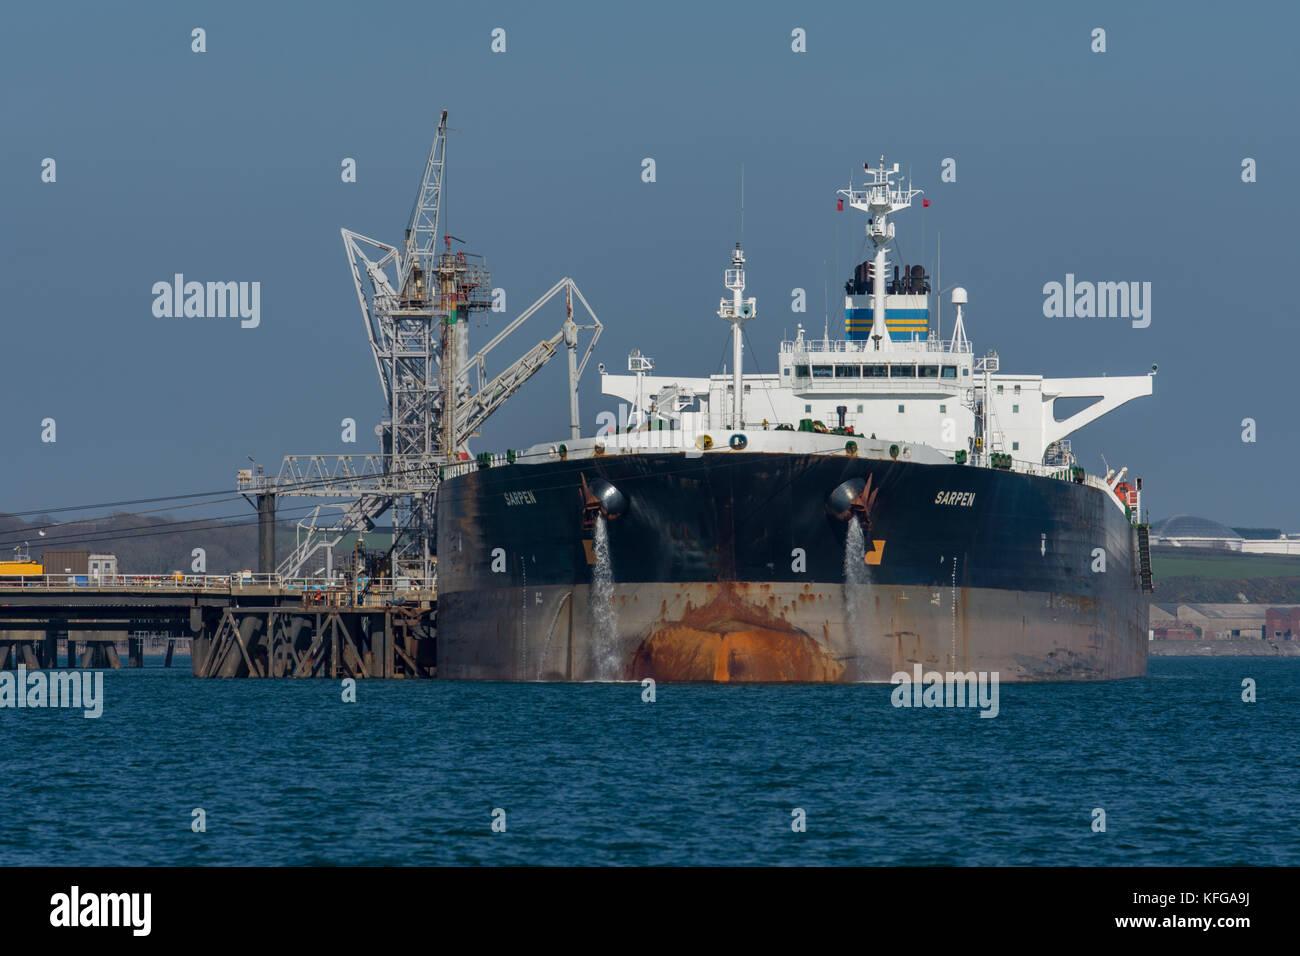 Supertanker Sarpen unloading at Valero Oil Terminal, Milford Haven Stock Photo